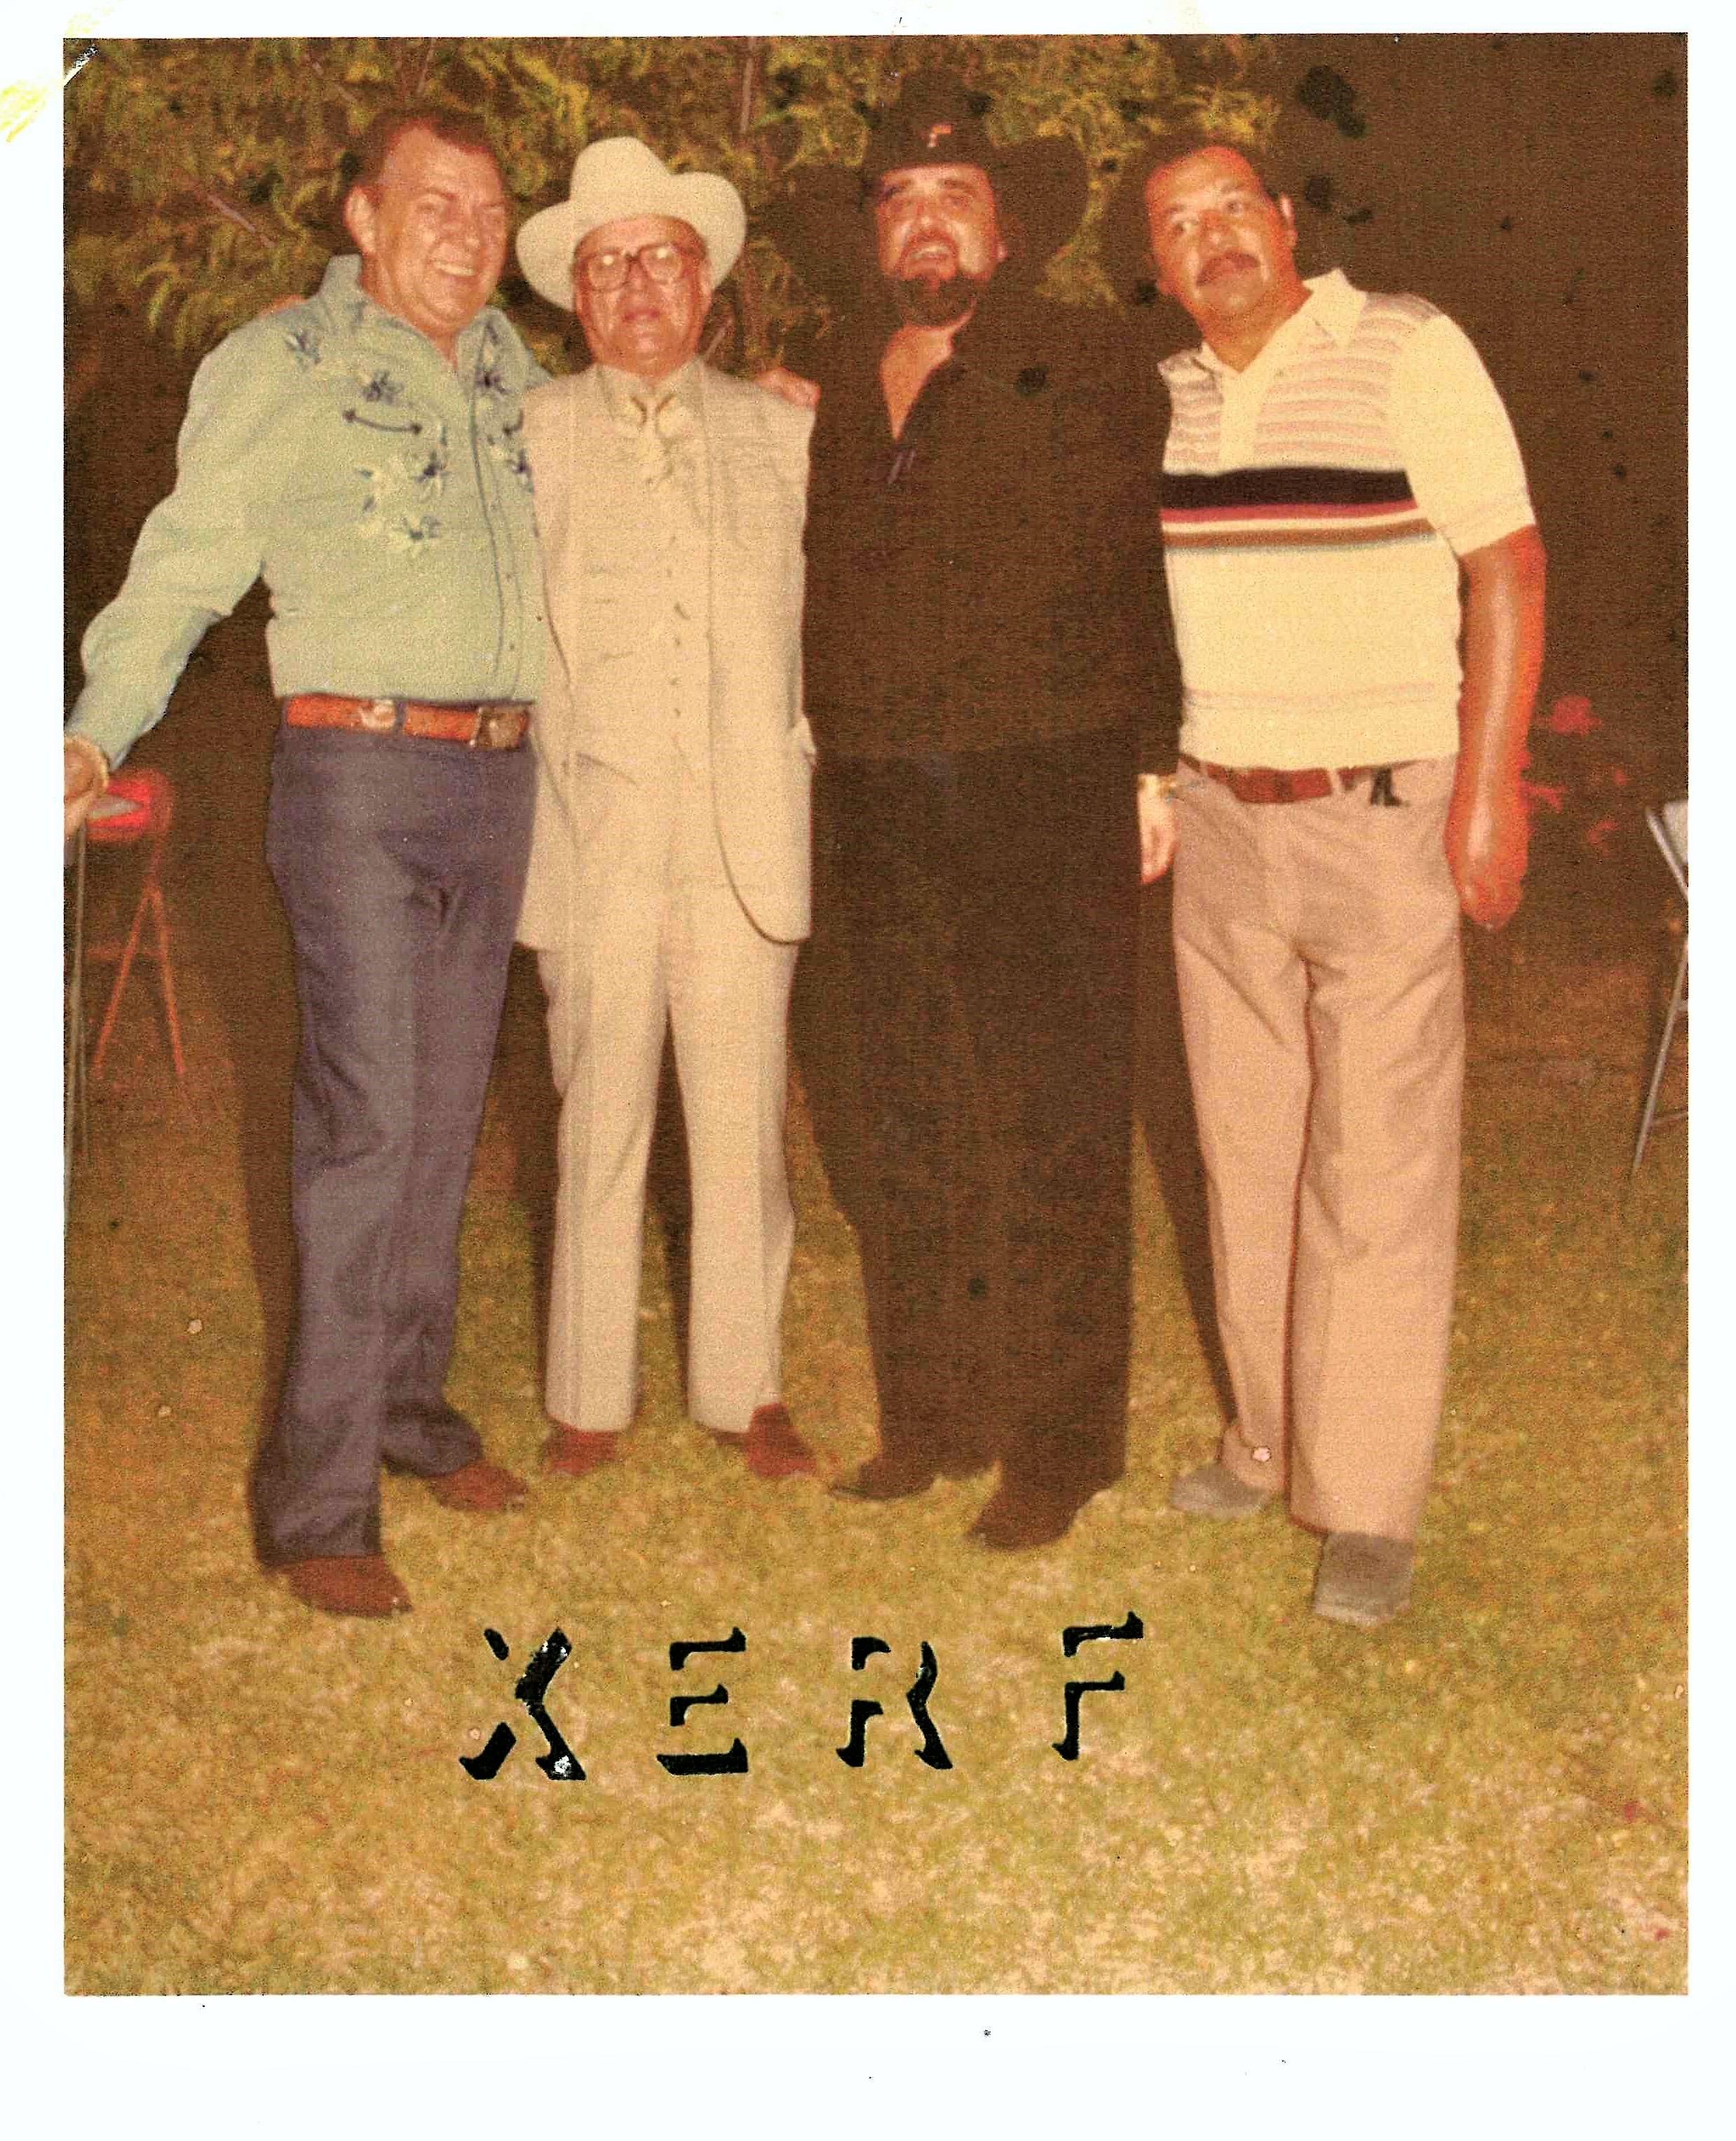 XERF Wolfman 1.jpeg